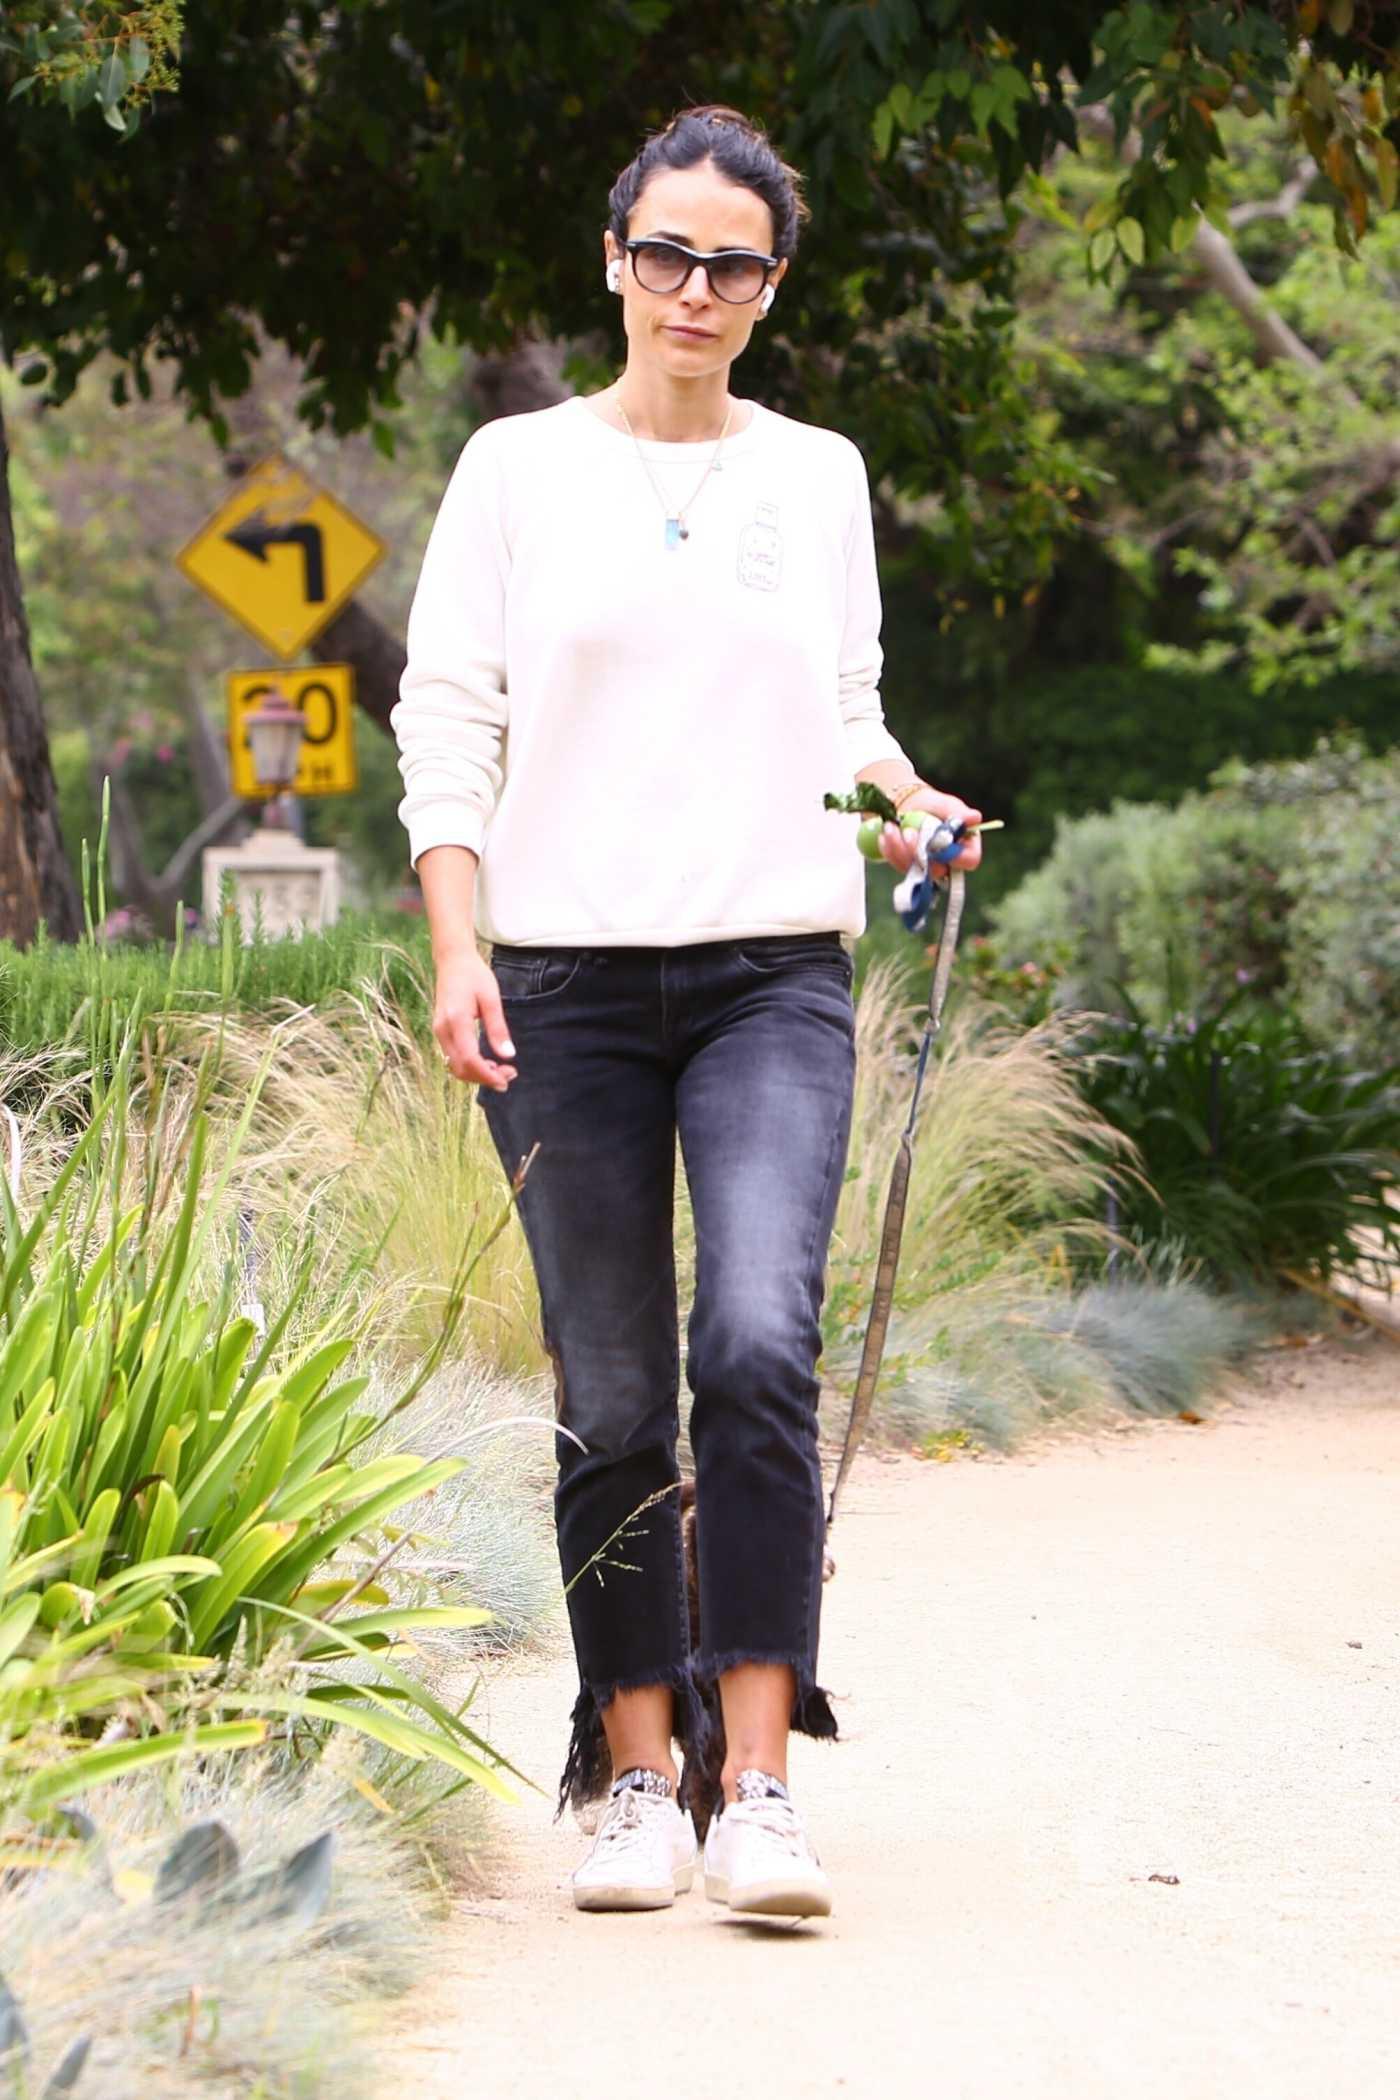 Jordana Brewster in a White Sneakers Walks Her Dog in Los Angeles 05/09/2020